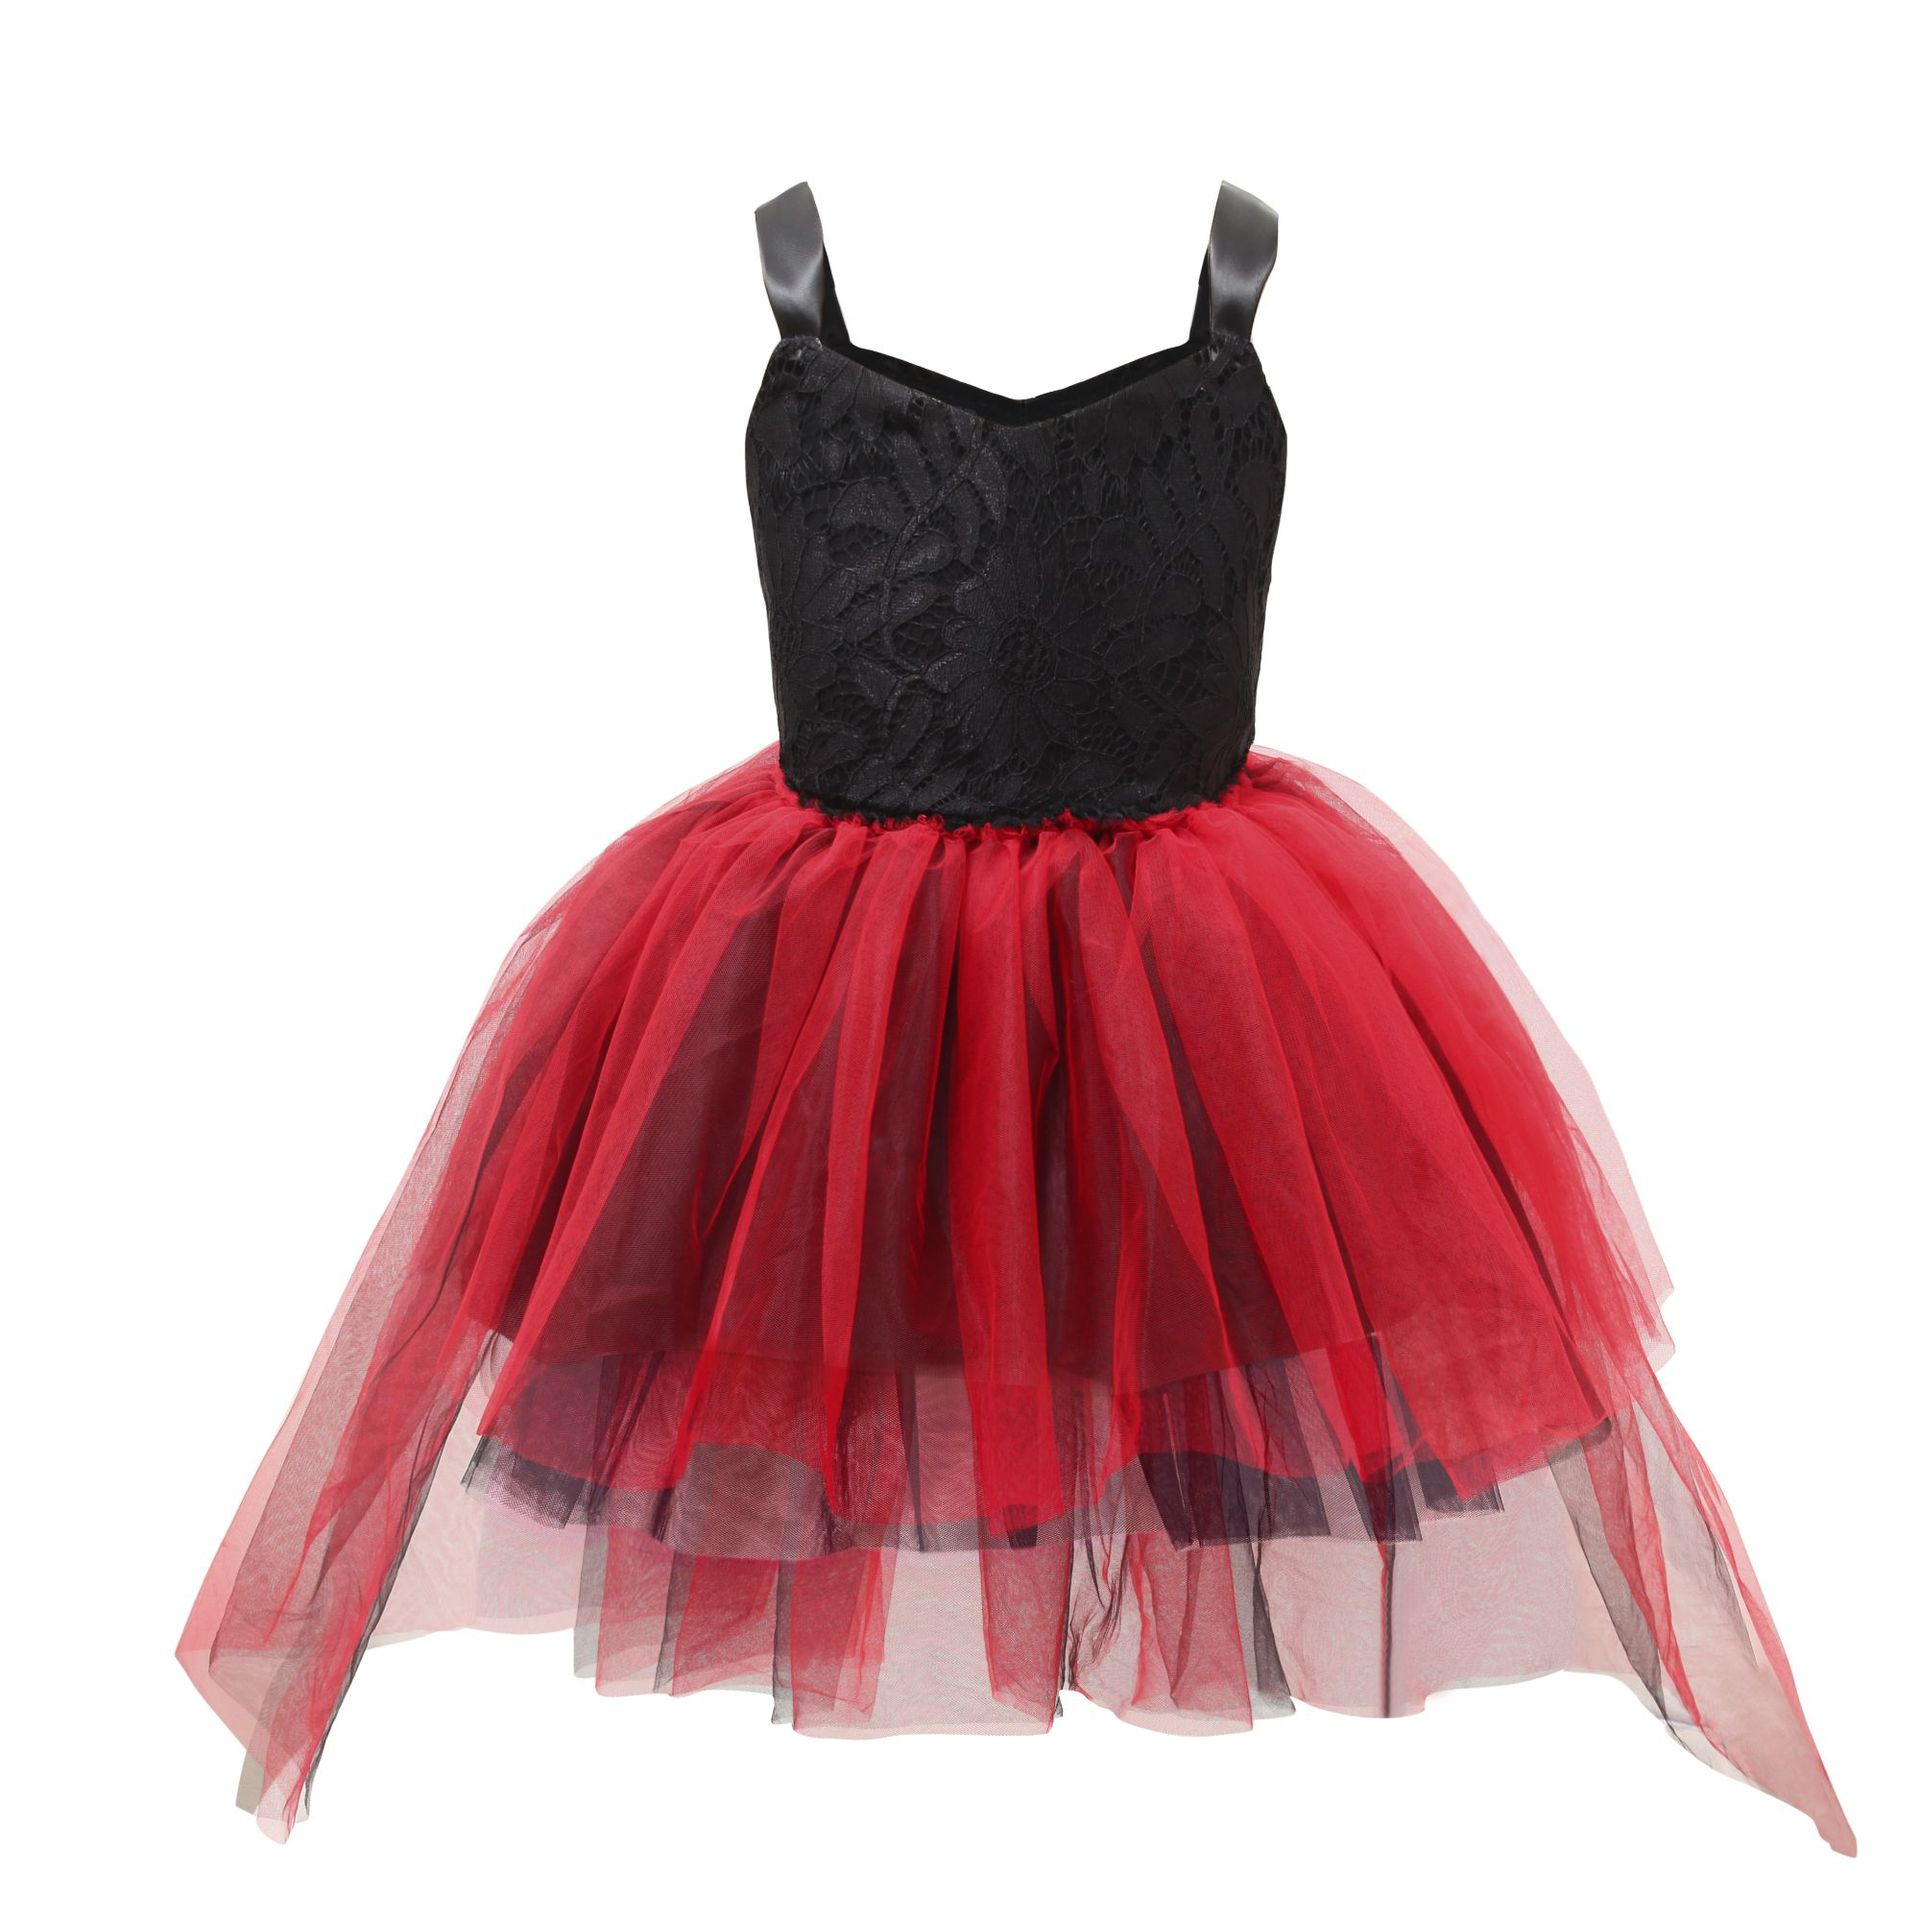 2020 Wedding Baby Flower-girl Skirt Girls Princess Dress Children Ballet Dress For Girls Party Dress Spring Summer Tulle Clothes